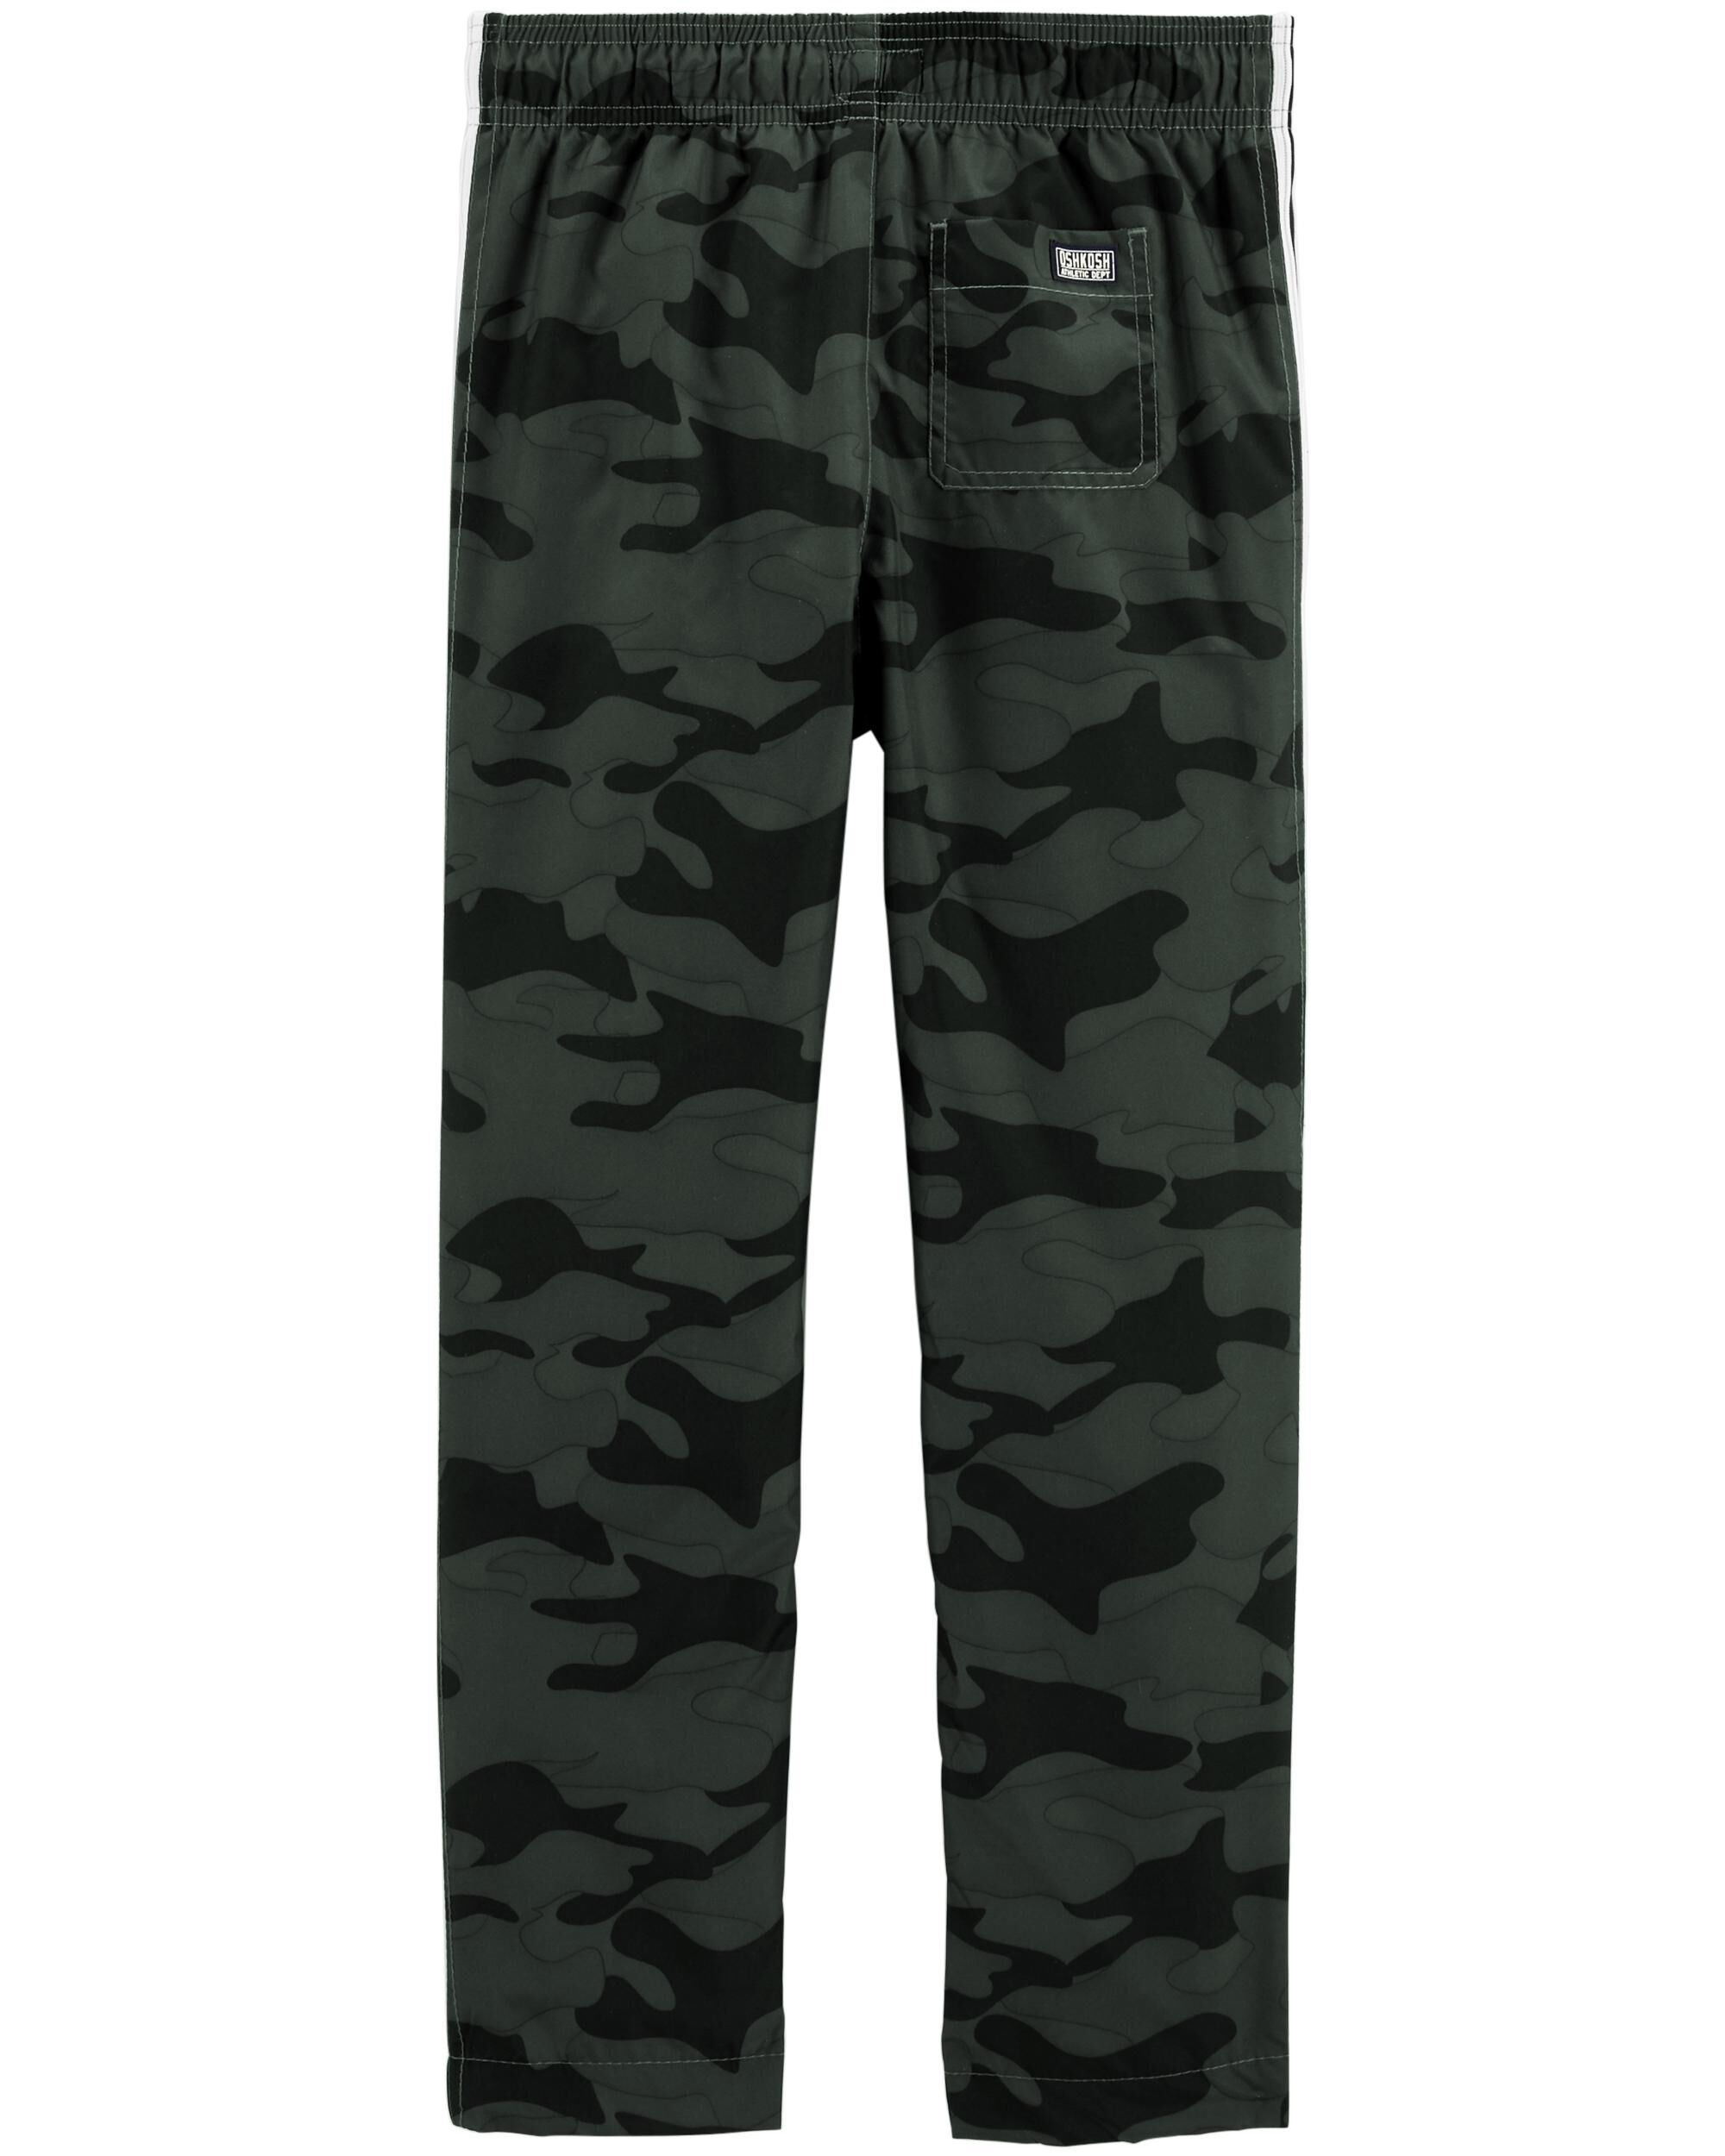 575484e25 Active Camo Pants · Active Camo Pants ...